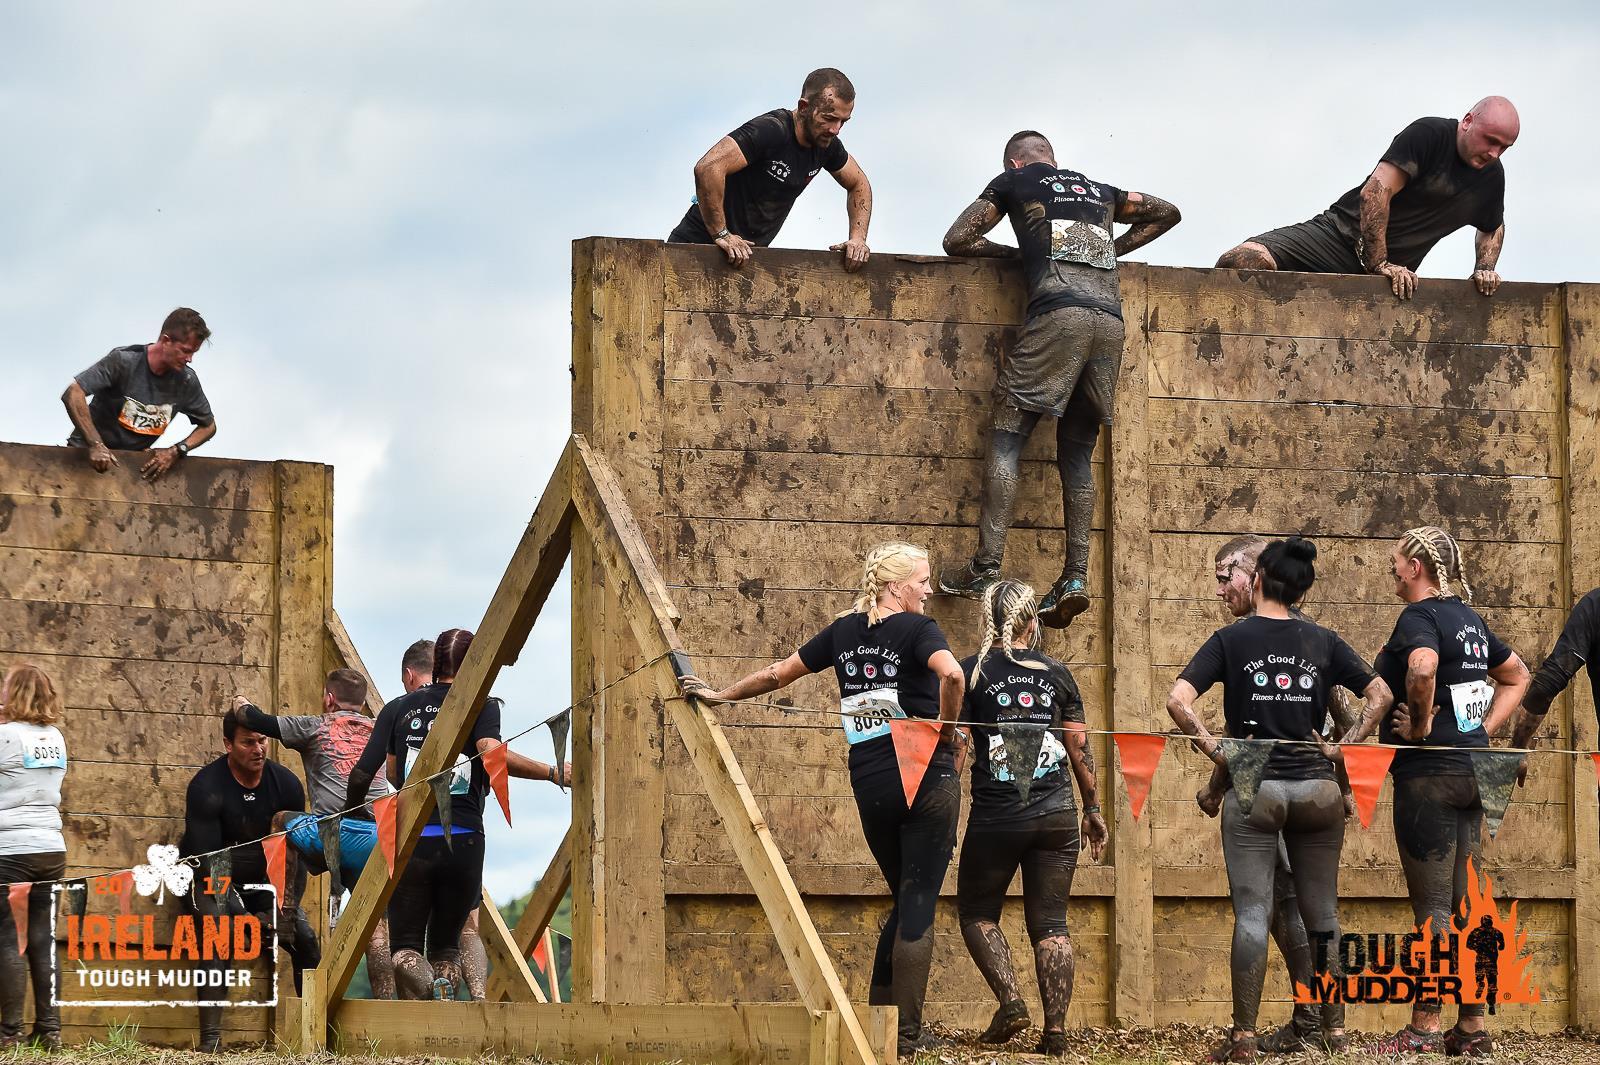 tough-mudder-ireland-03.jpg